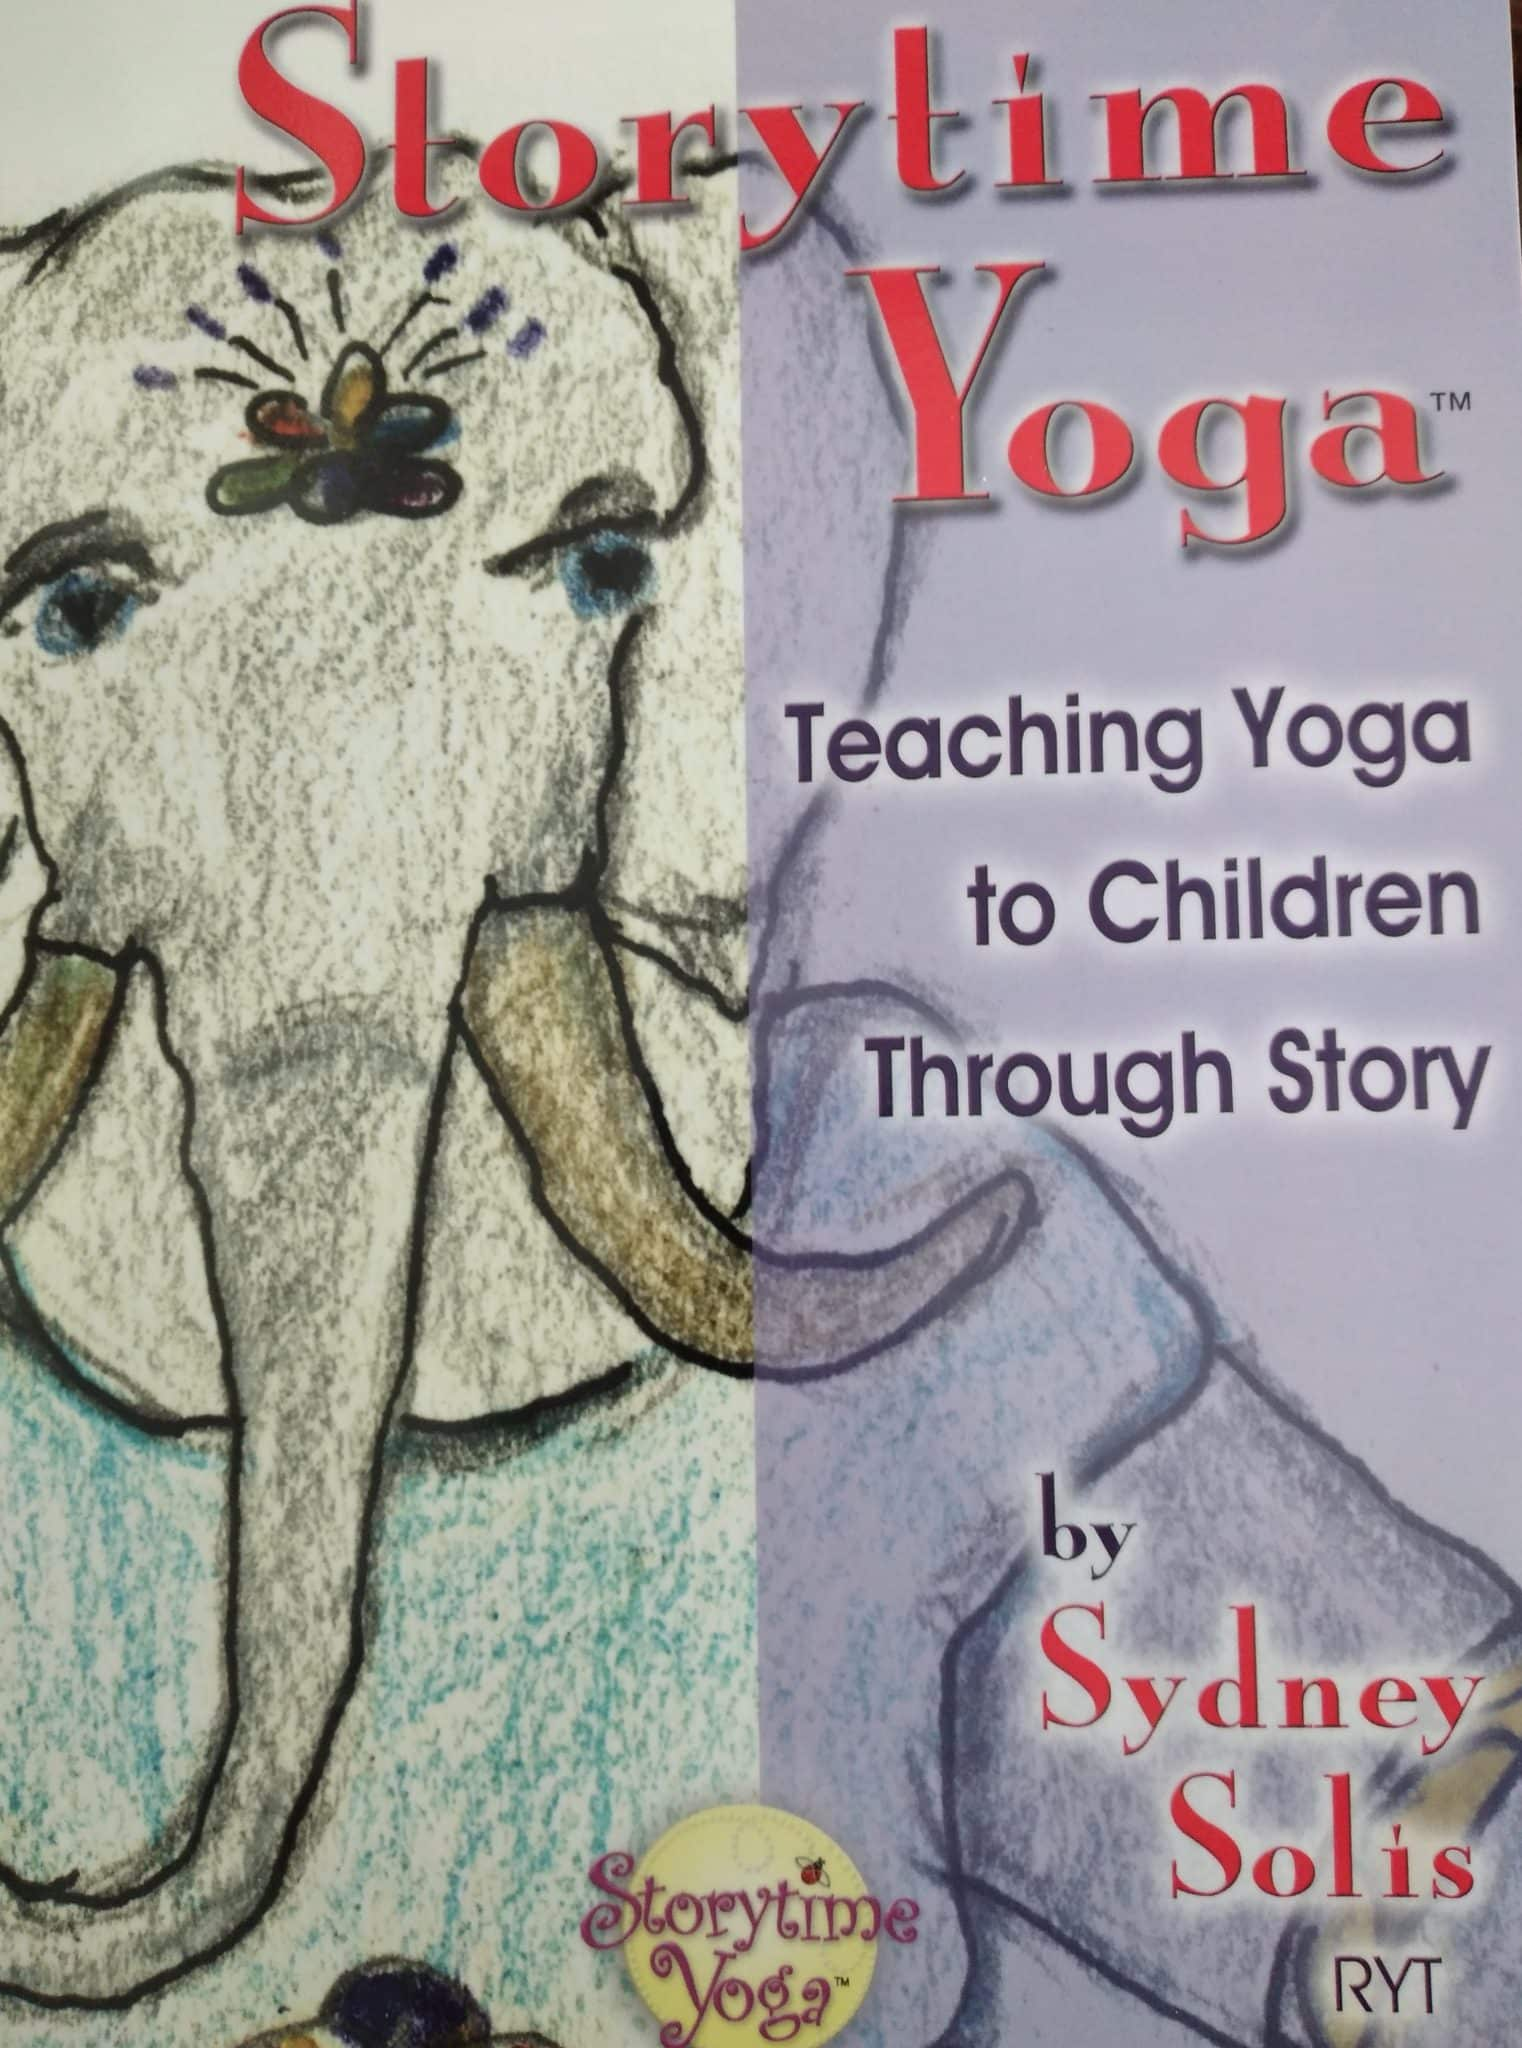 Storytime Yoga. Teaching Yoga To Children Through Story